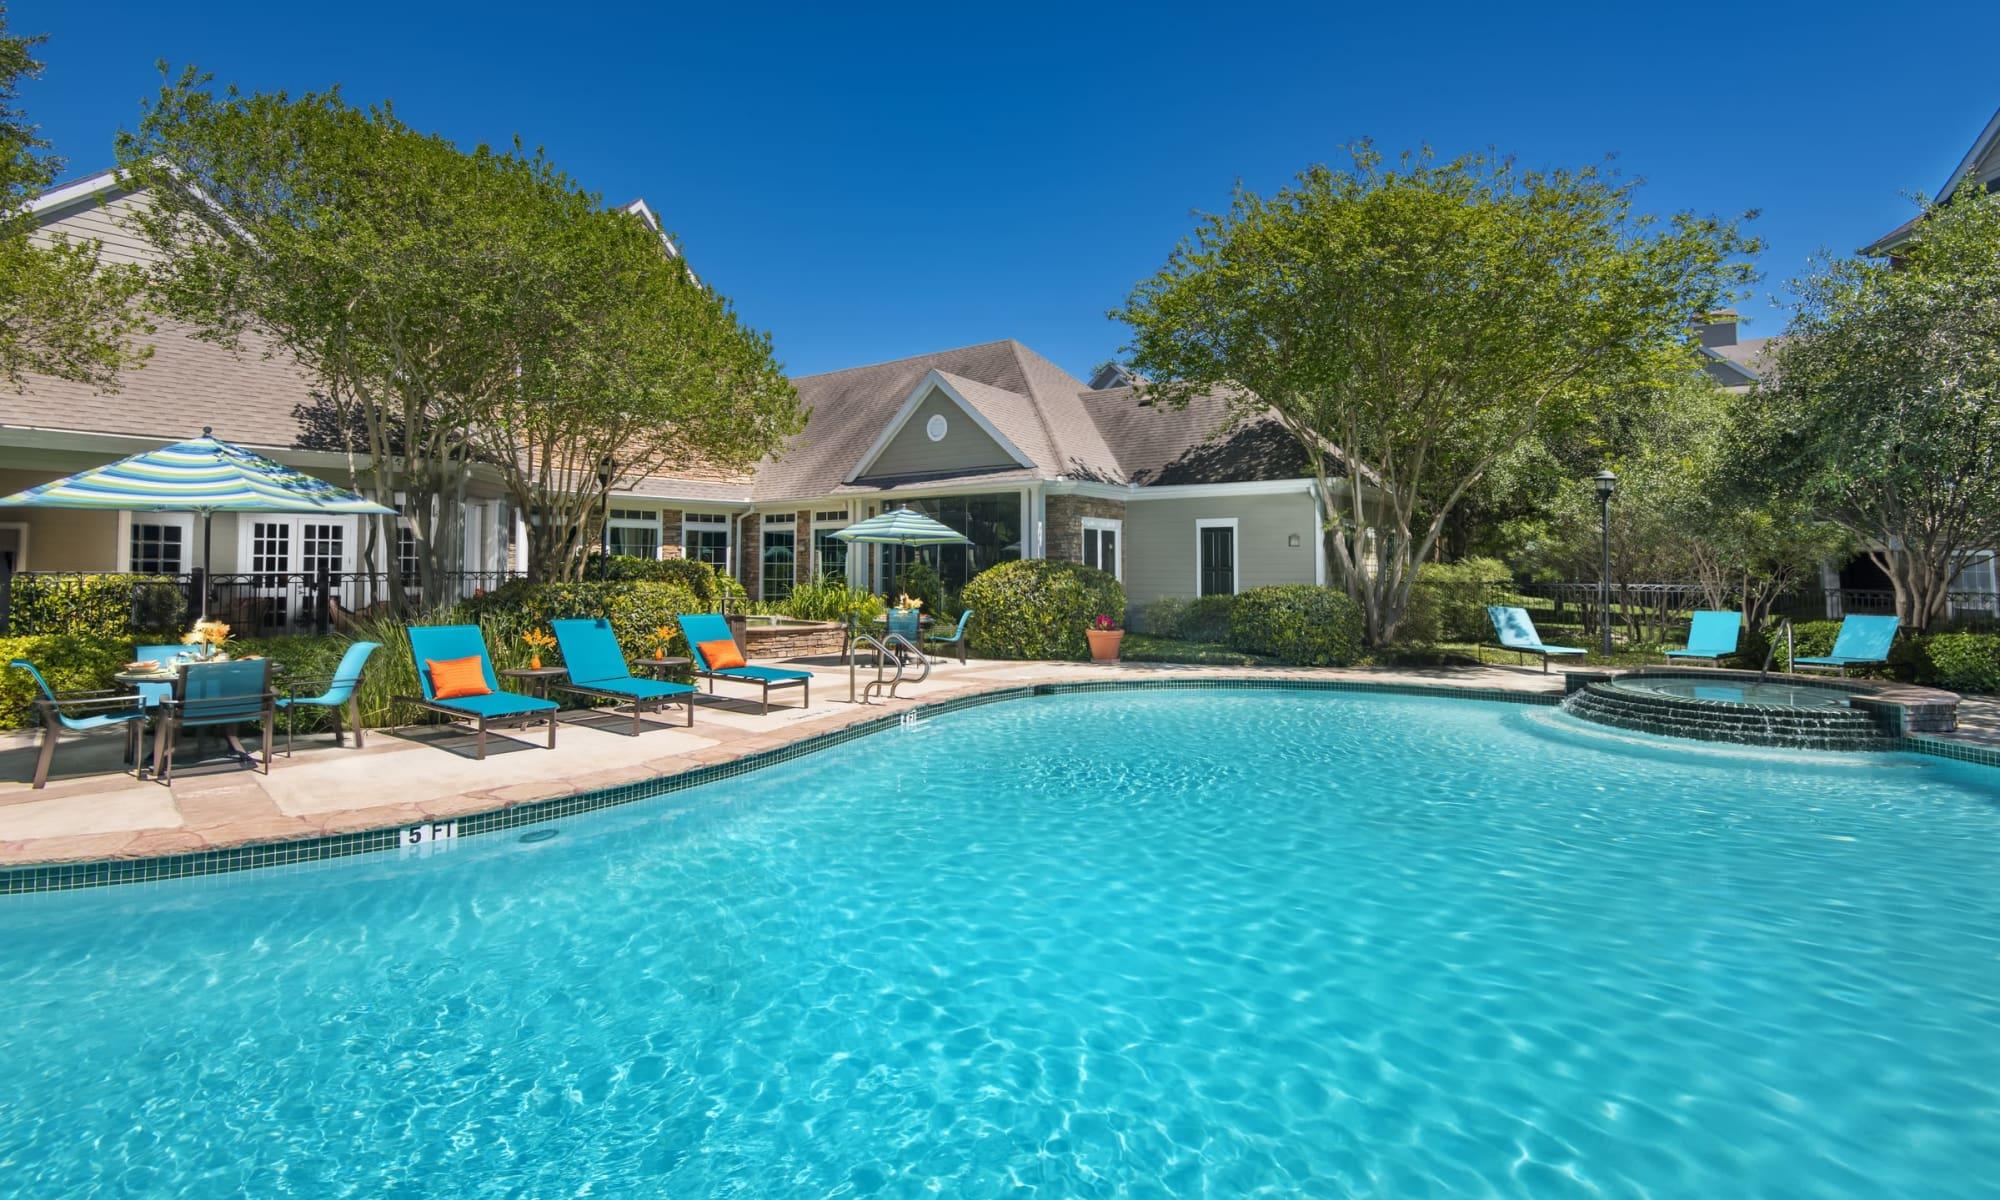 Apartments at The Lodge at Shavano Park in San Antonio, Texas